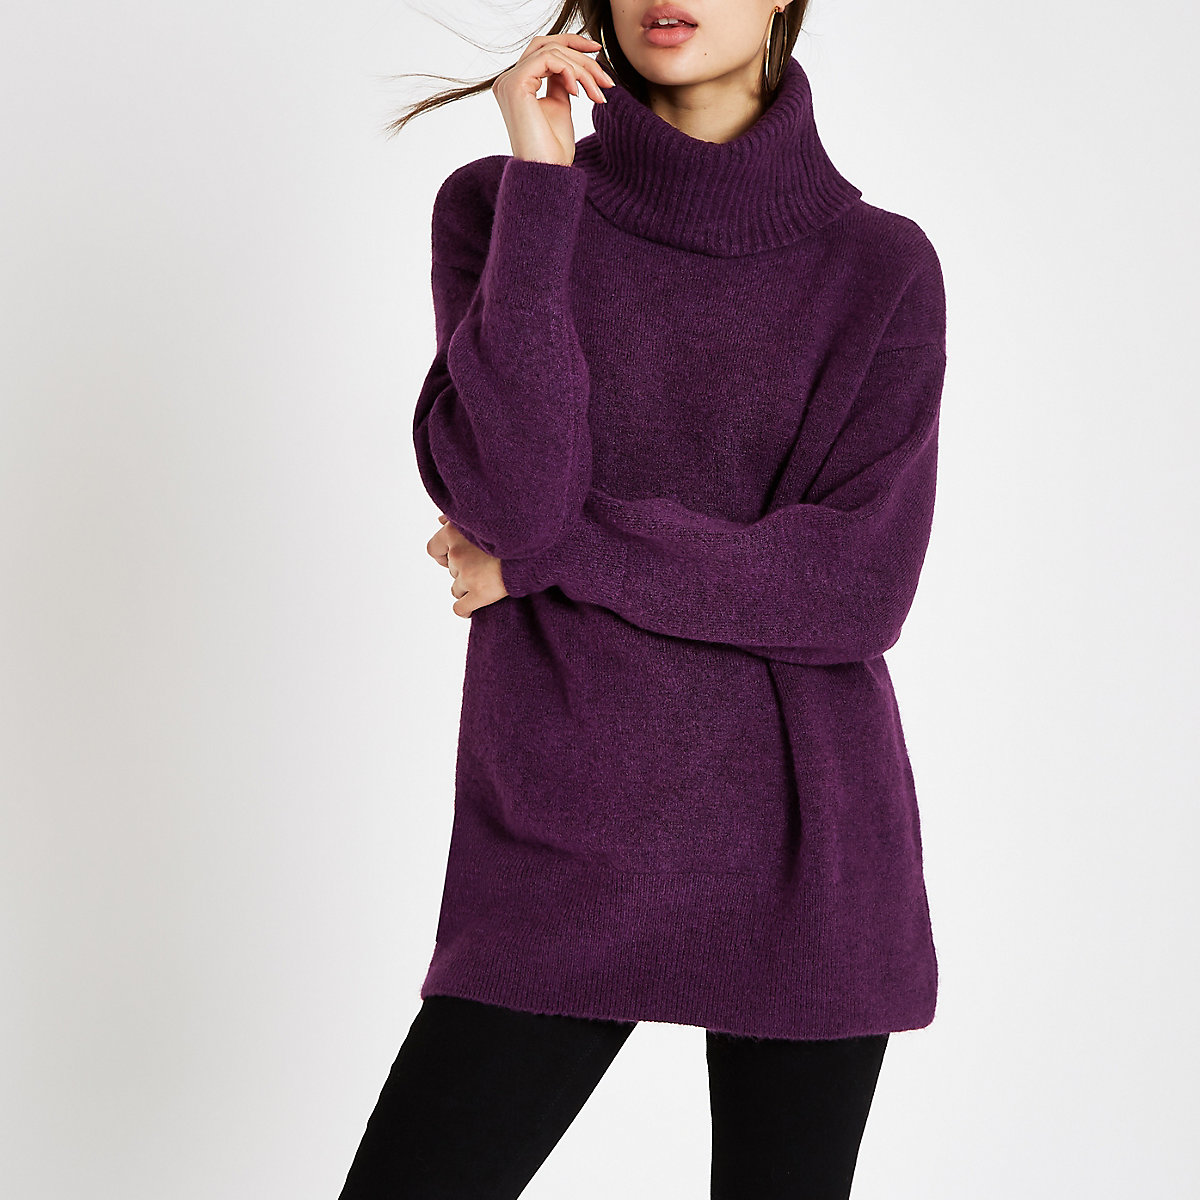 Purple roll neck knit jumper